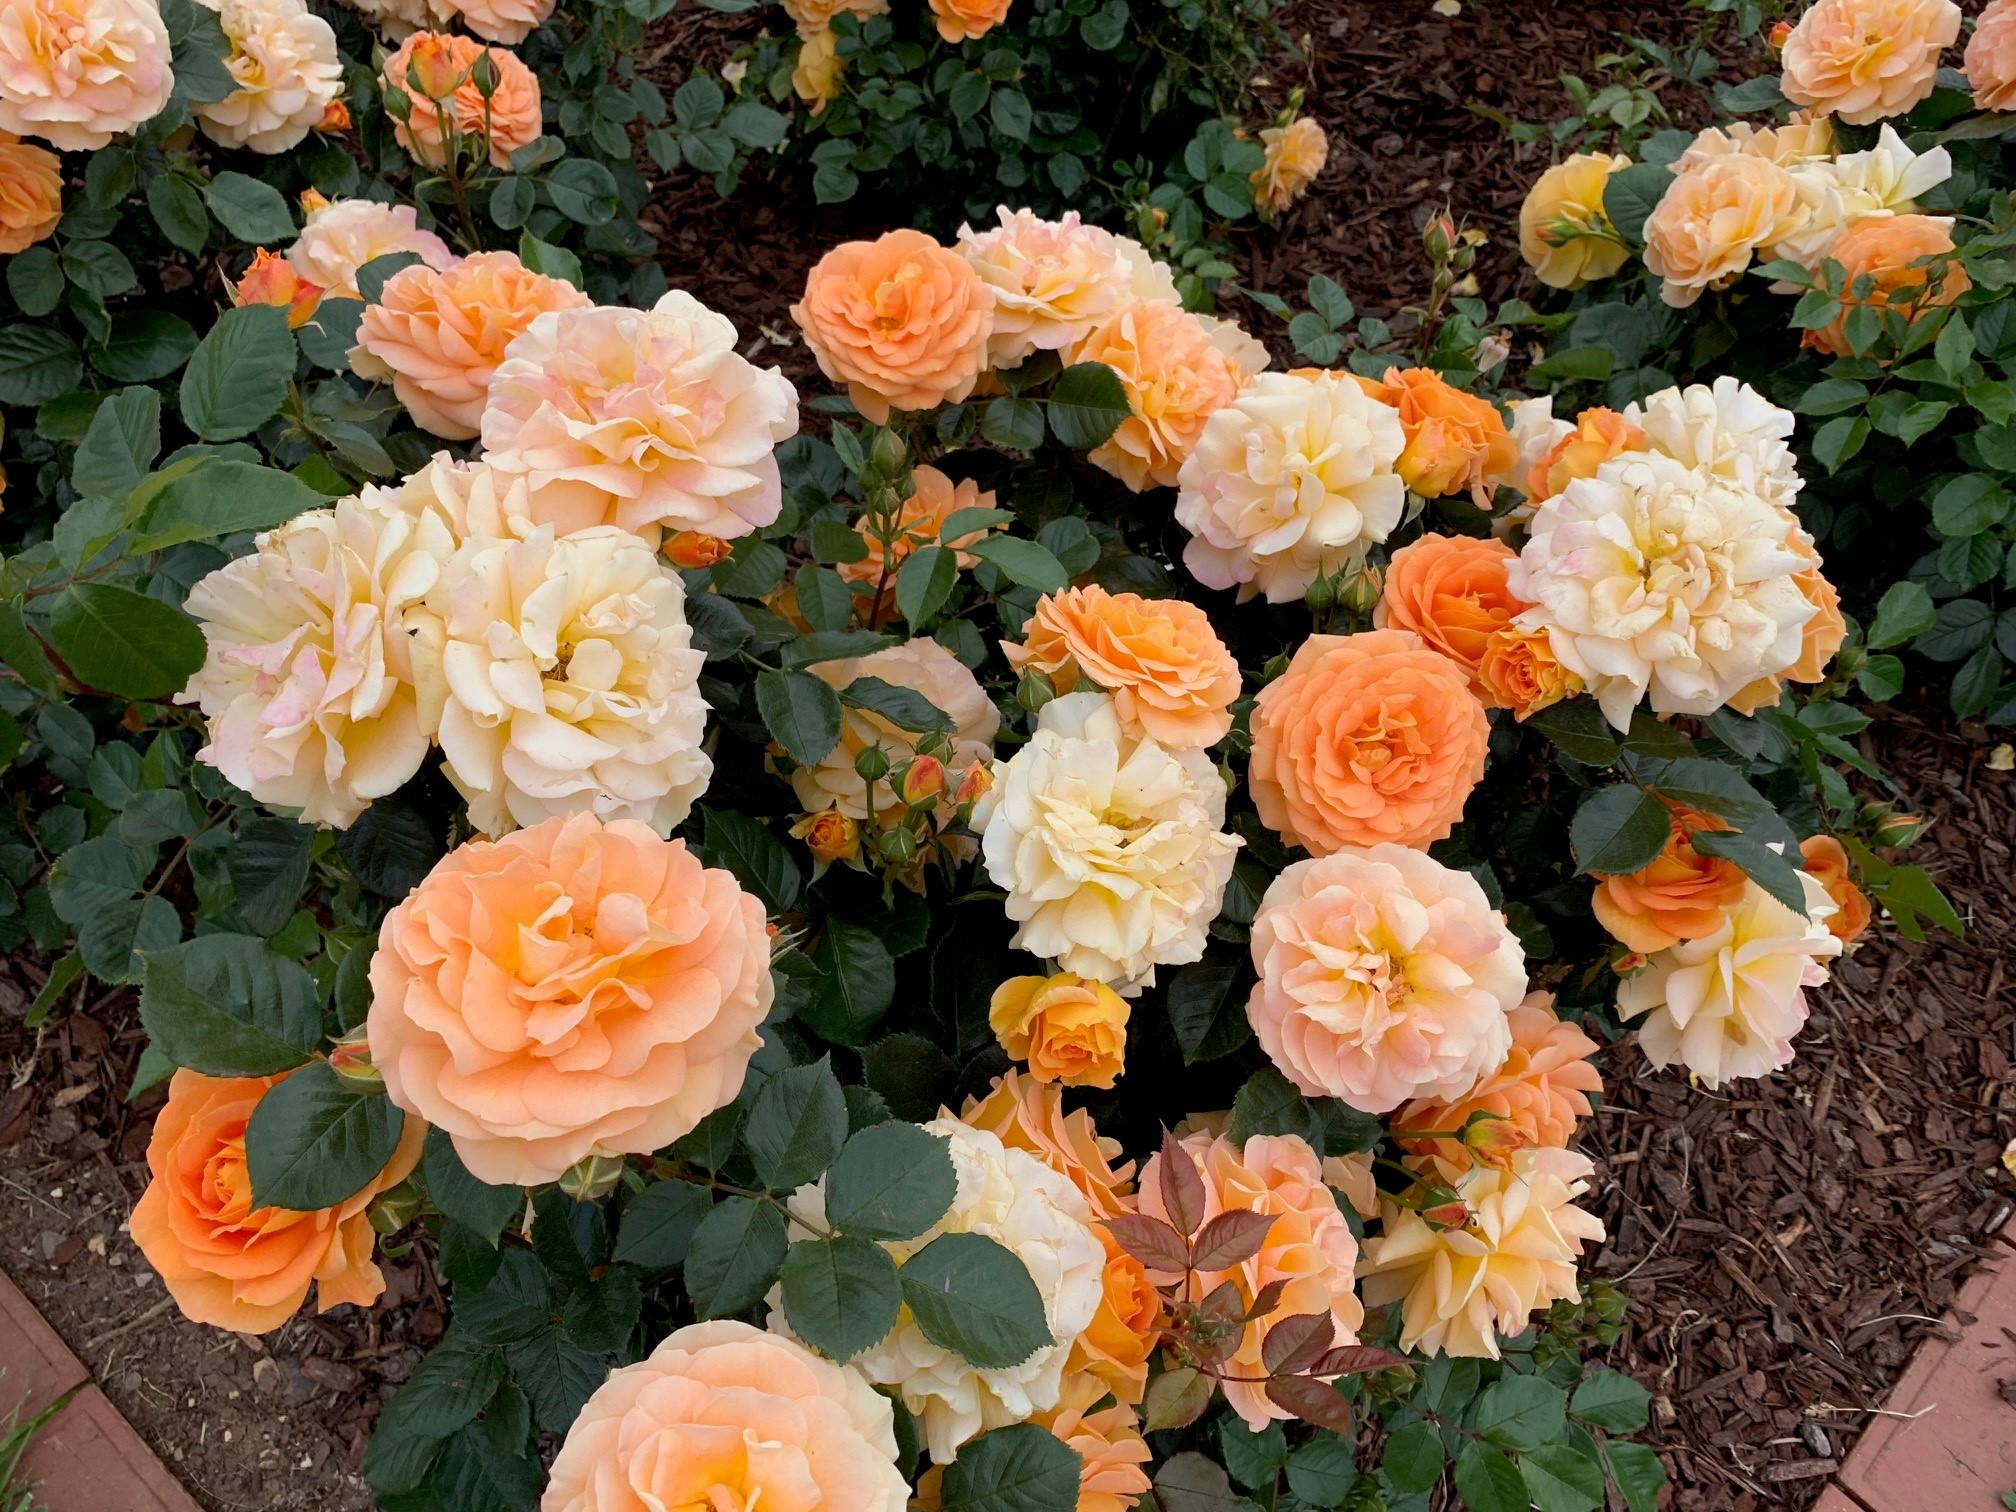 Victorian_State_Rose_Garden_Yellow_and_Orange_Roses.jpg